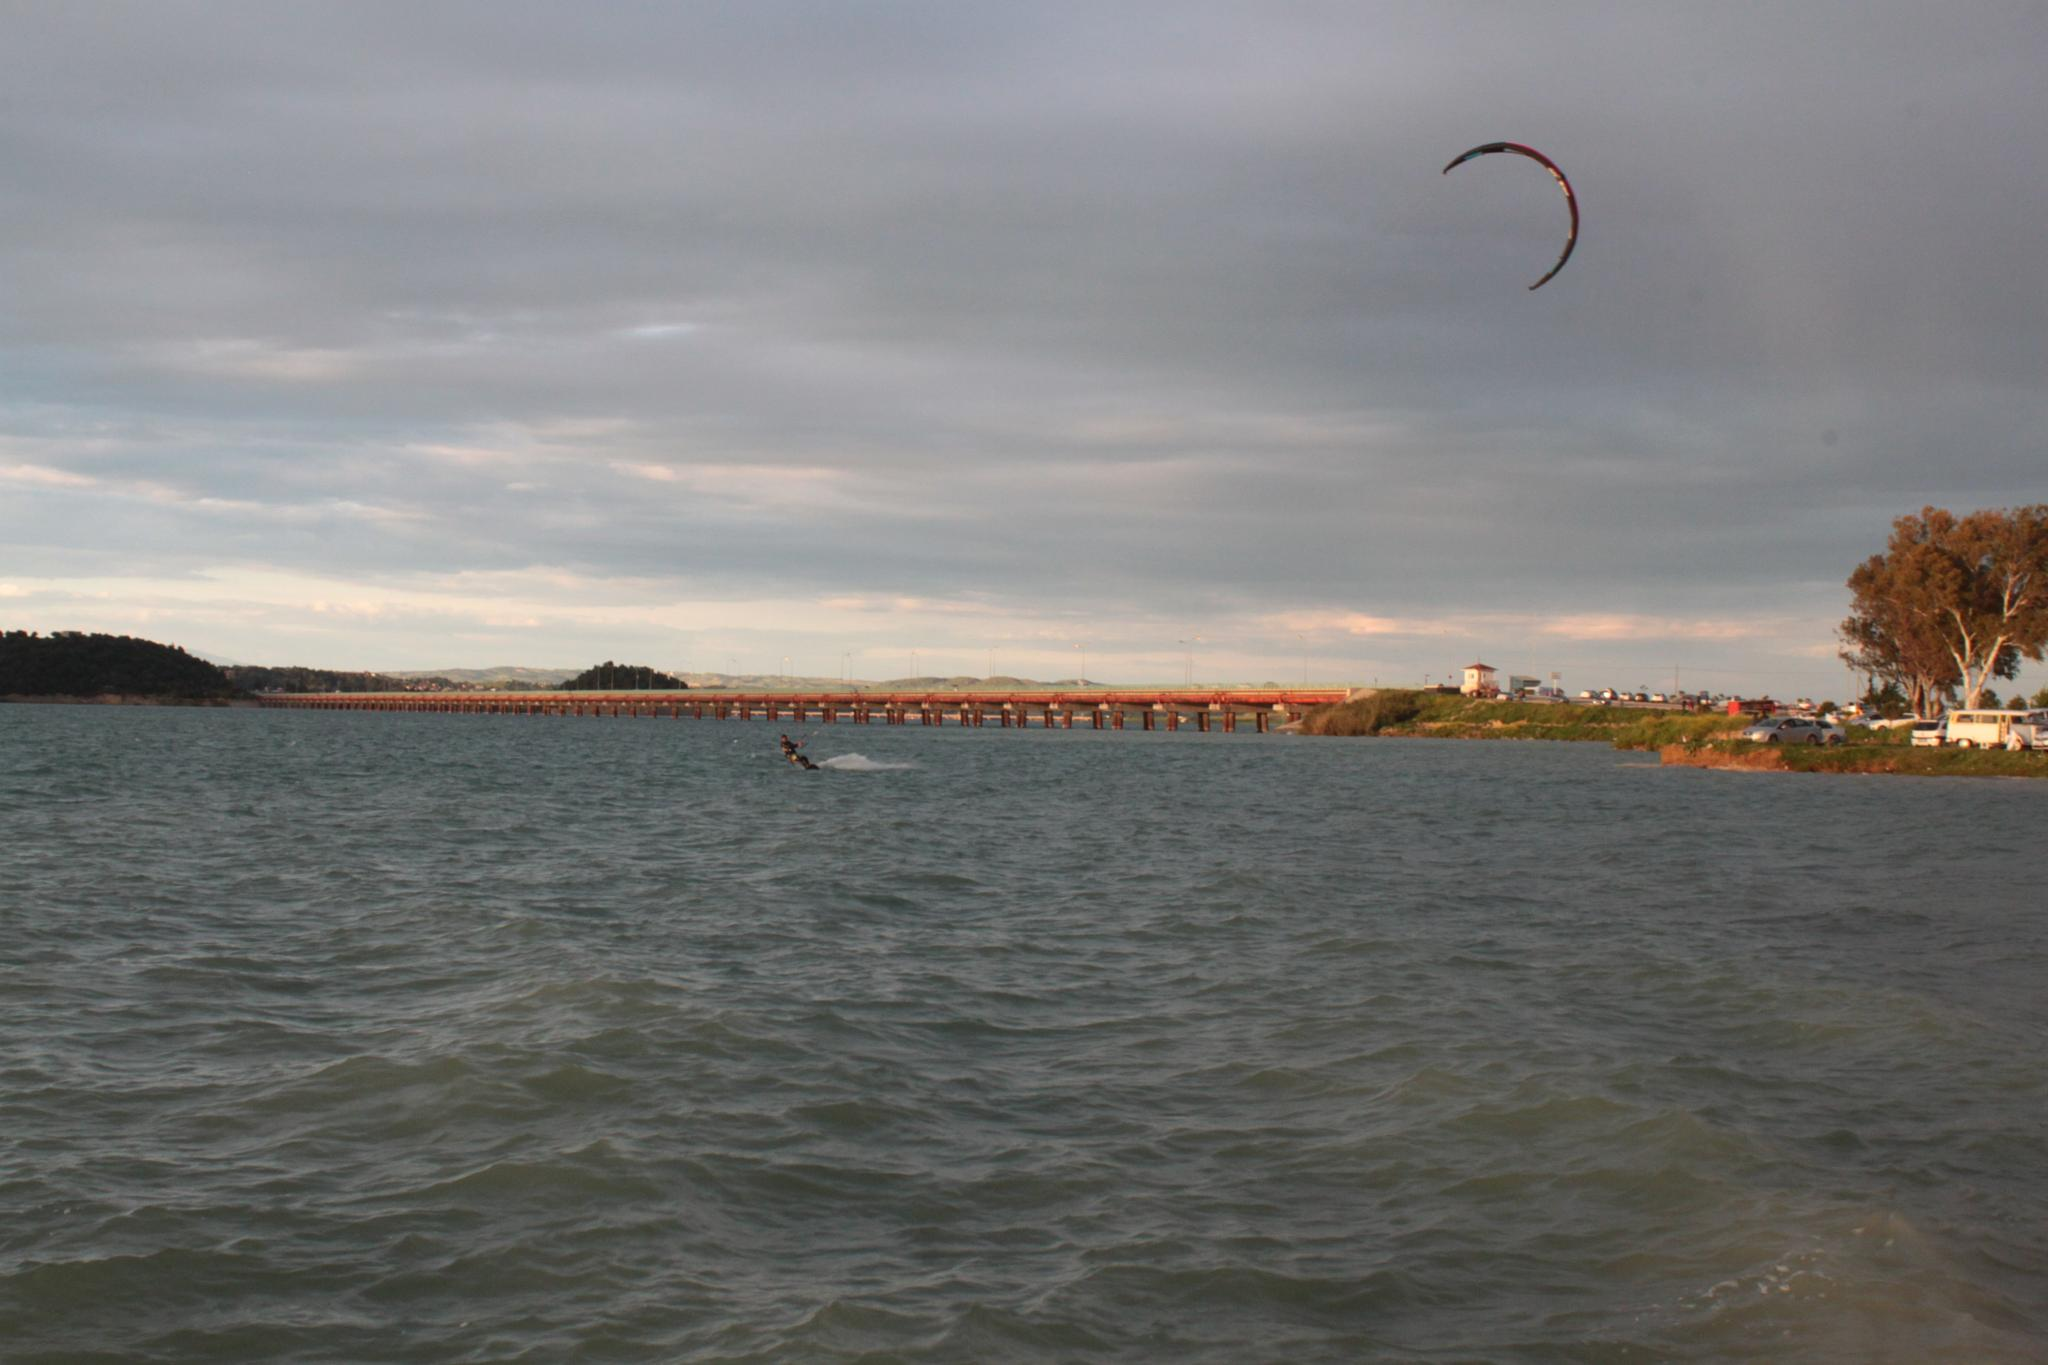 Seyhan Dam Lake by YAKUP ŞAHİN